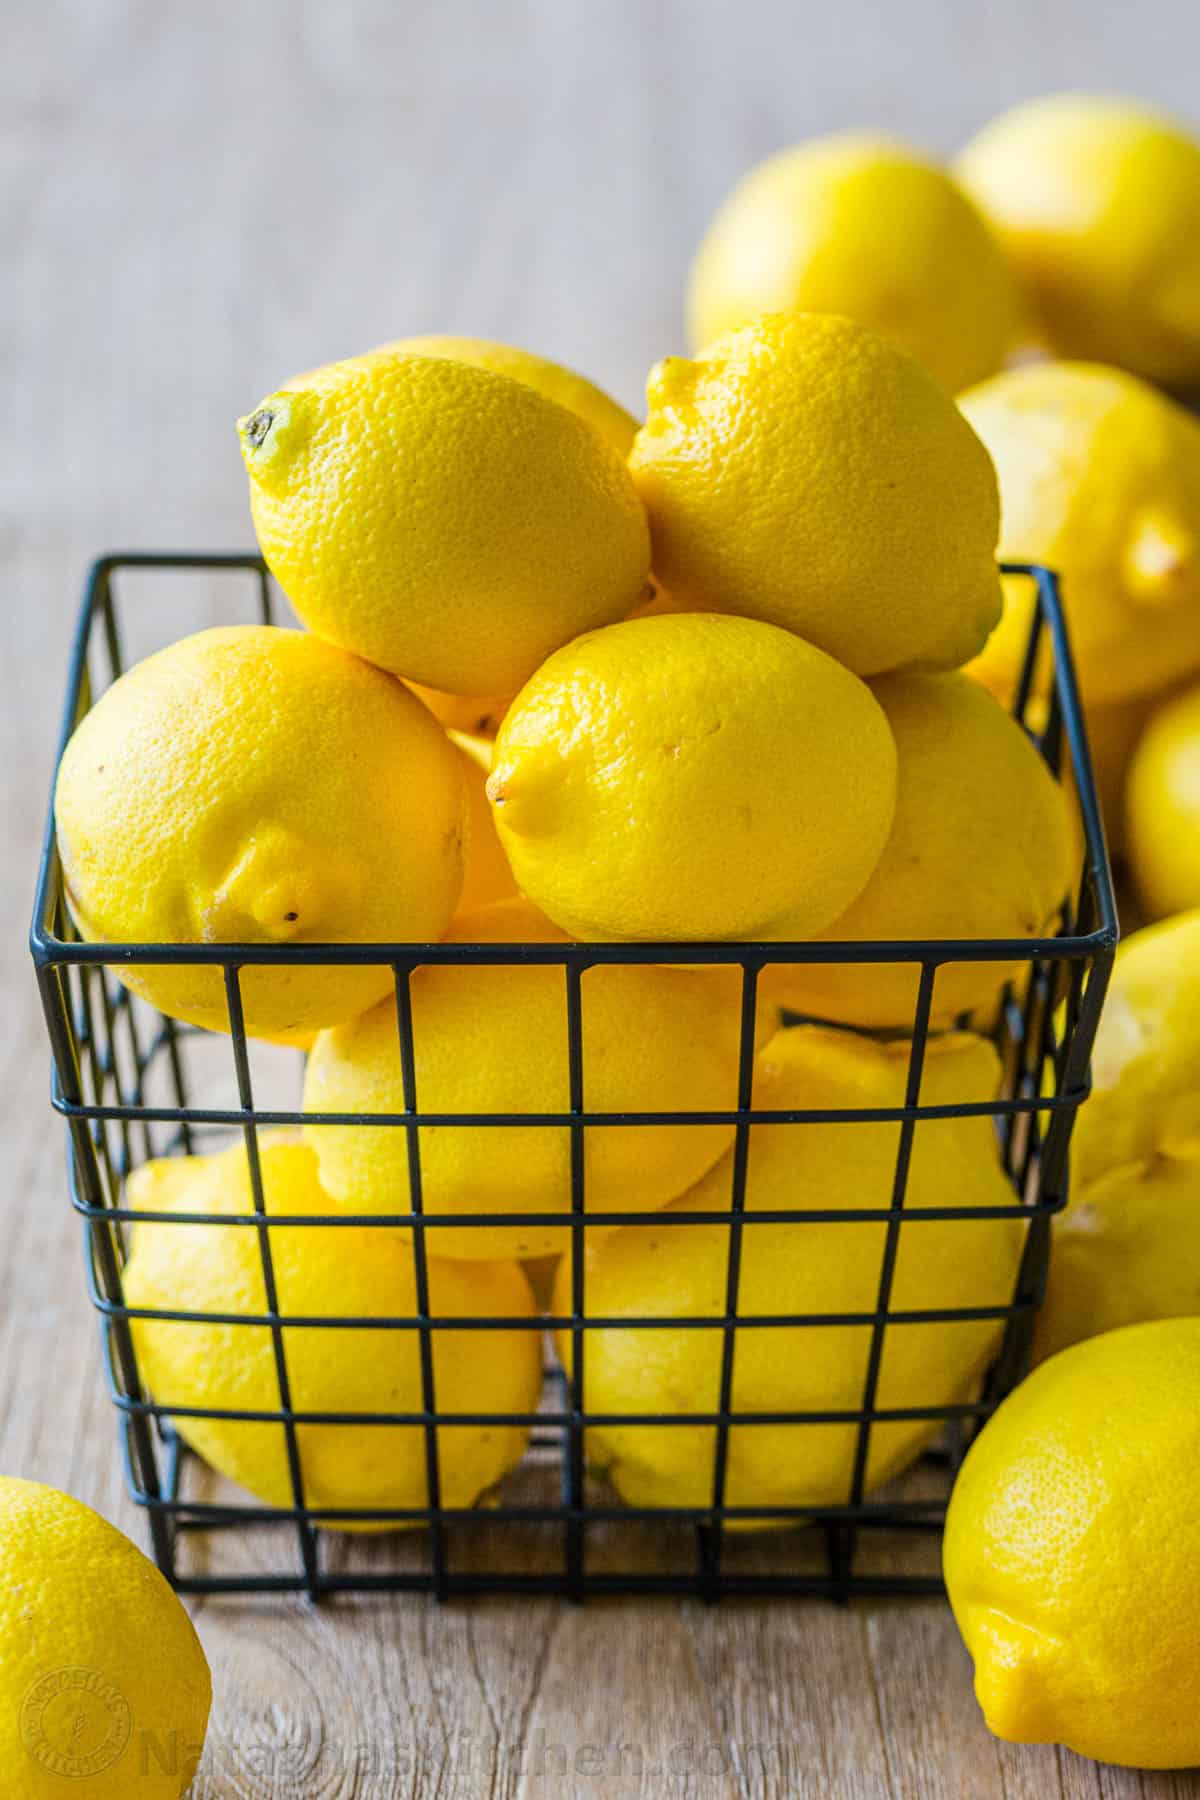 Lemons Zesting Juicing